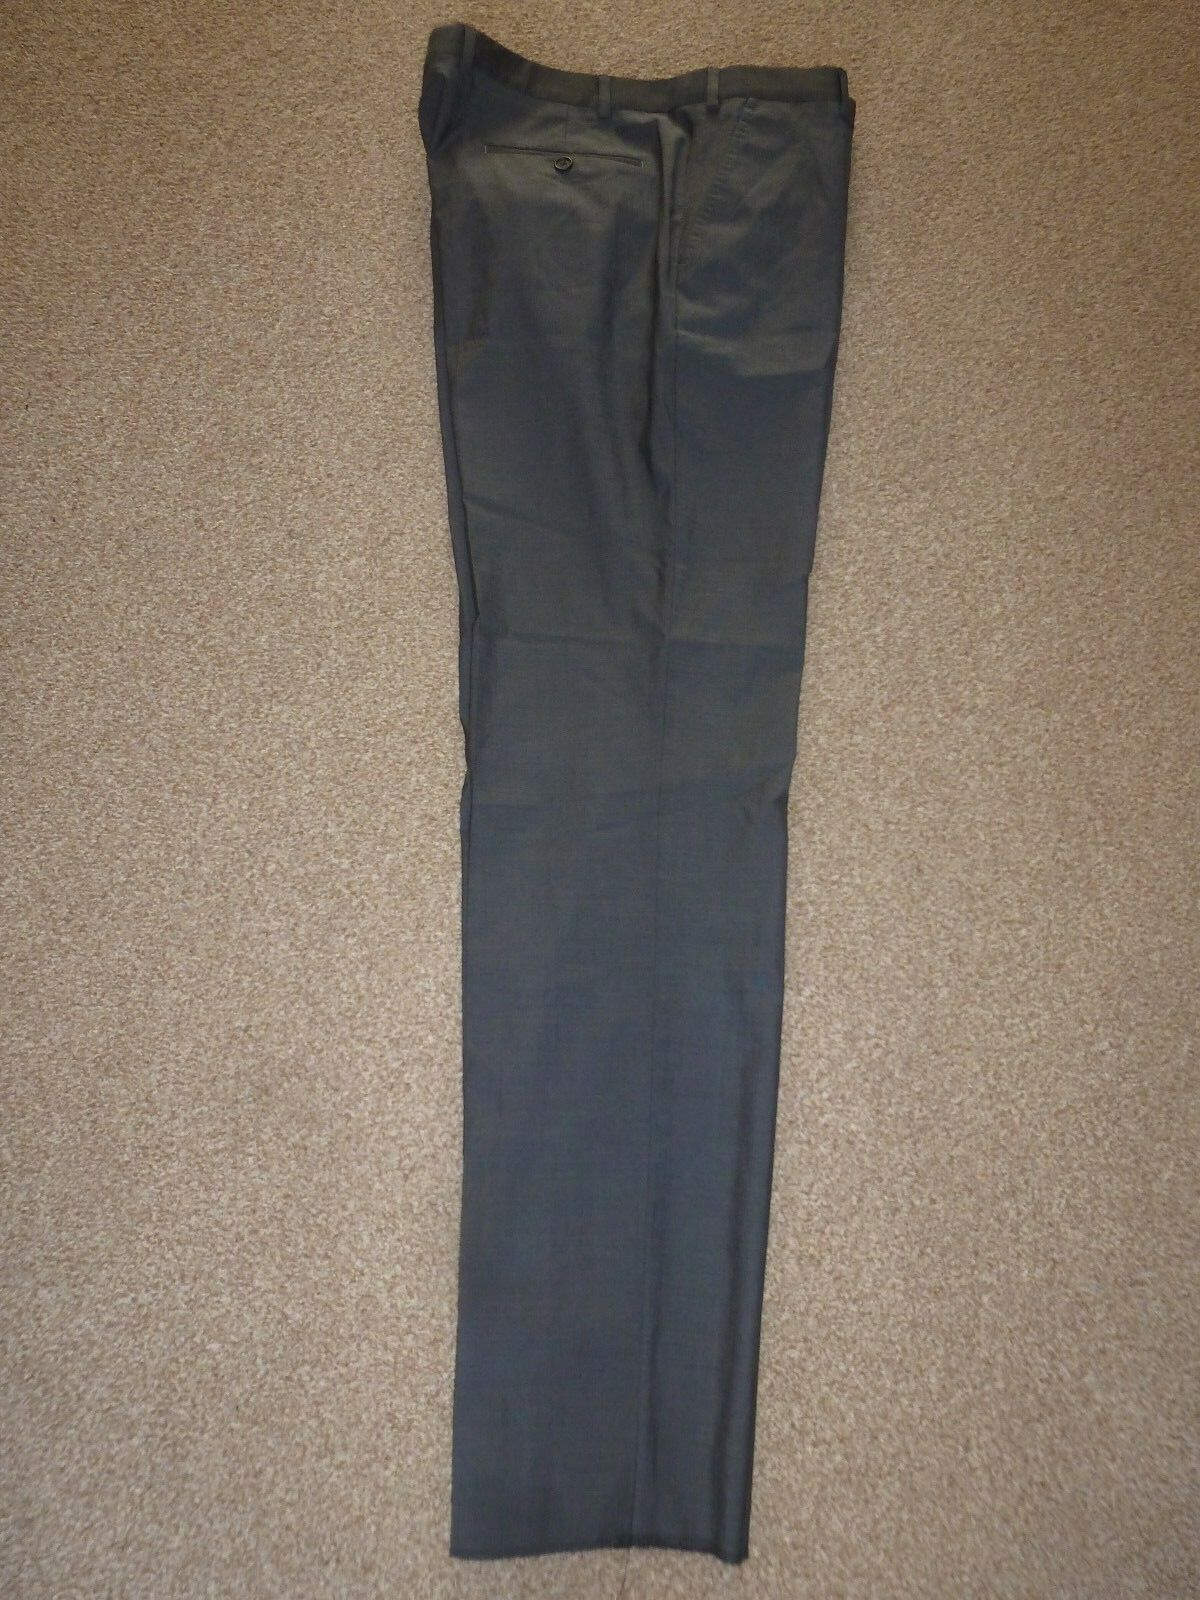 BNWT Homme Neuf Ted Baker Endurance Endurance Baker en laine gris veste de tailleur 36 R Taille 36 Jambe 33.5 50d0d3